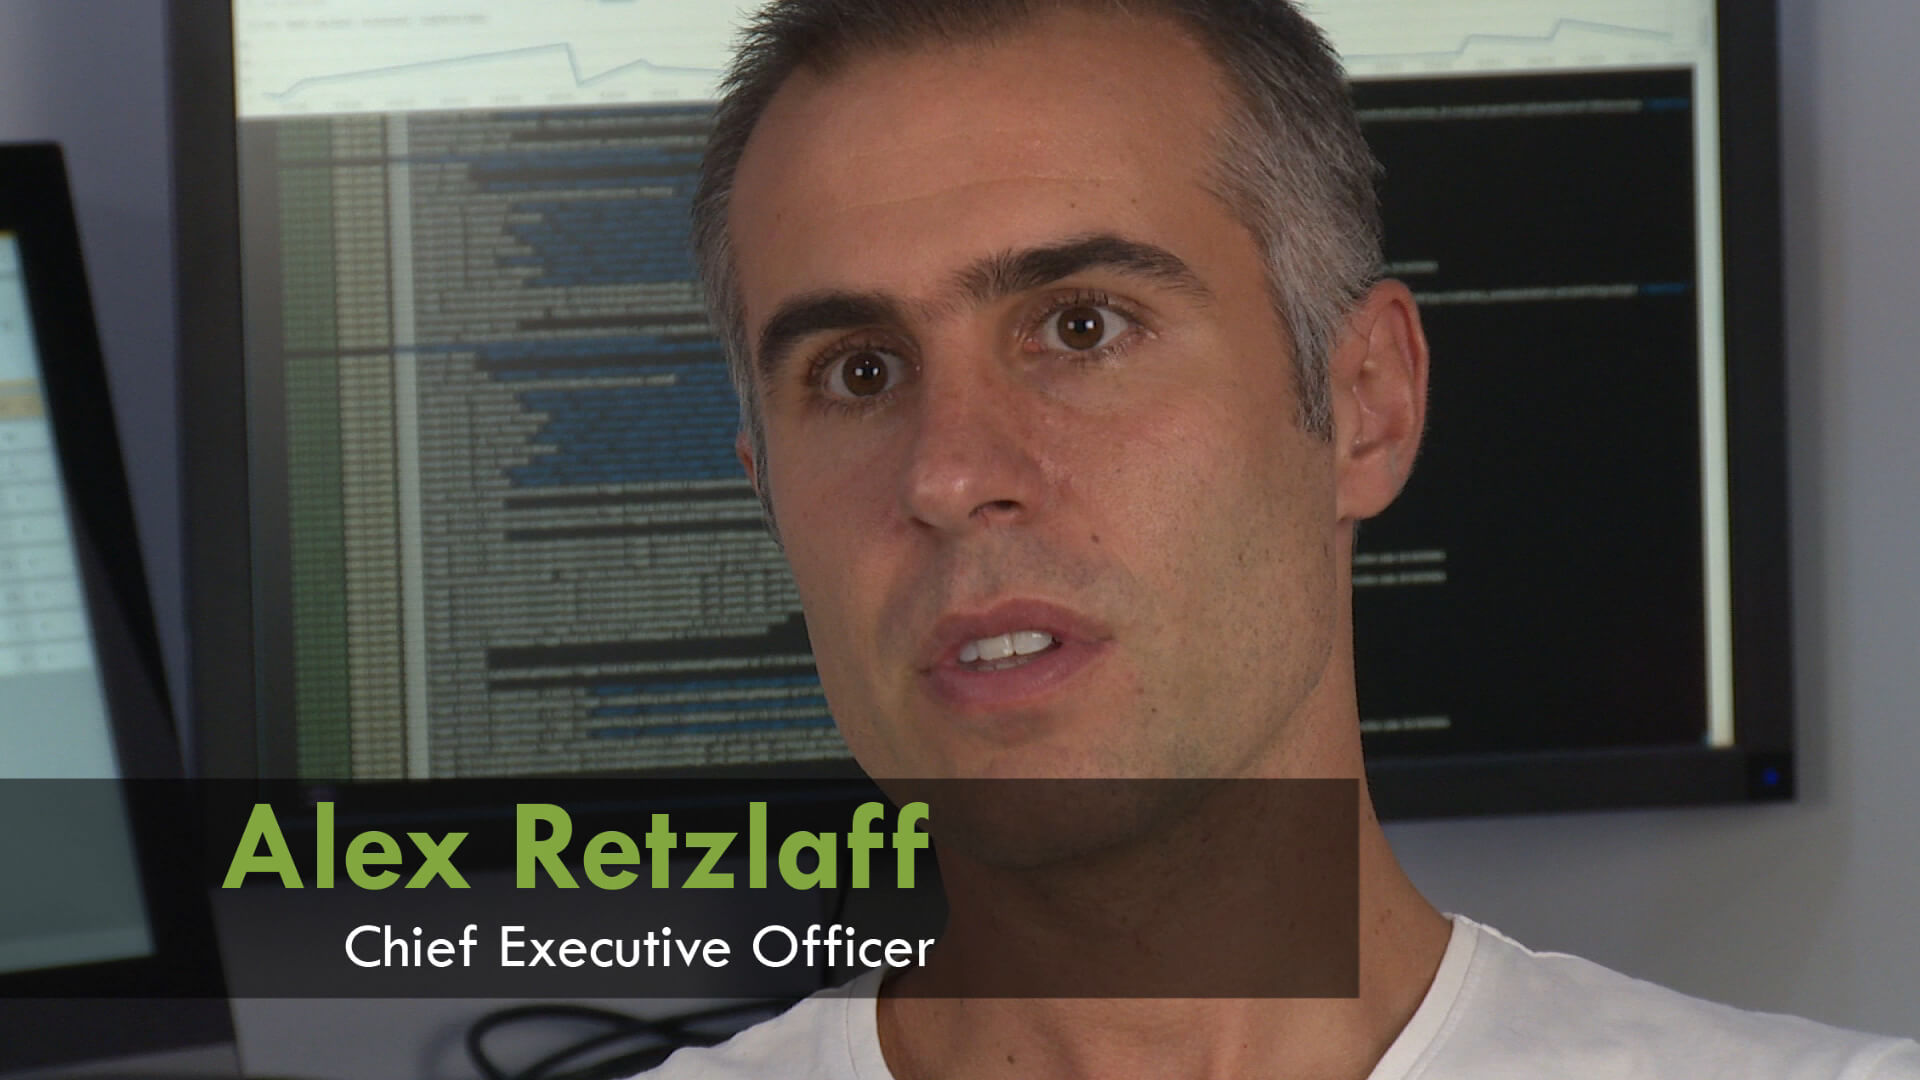 Fewzion Alex Retzlaff